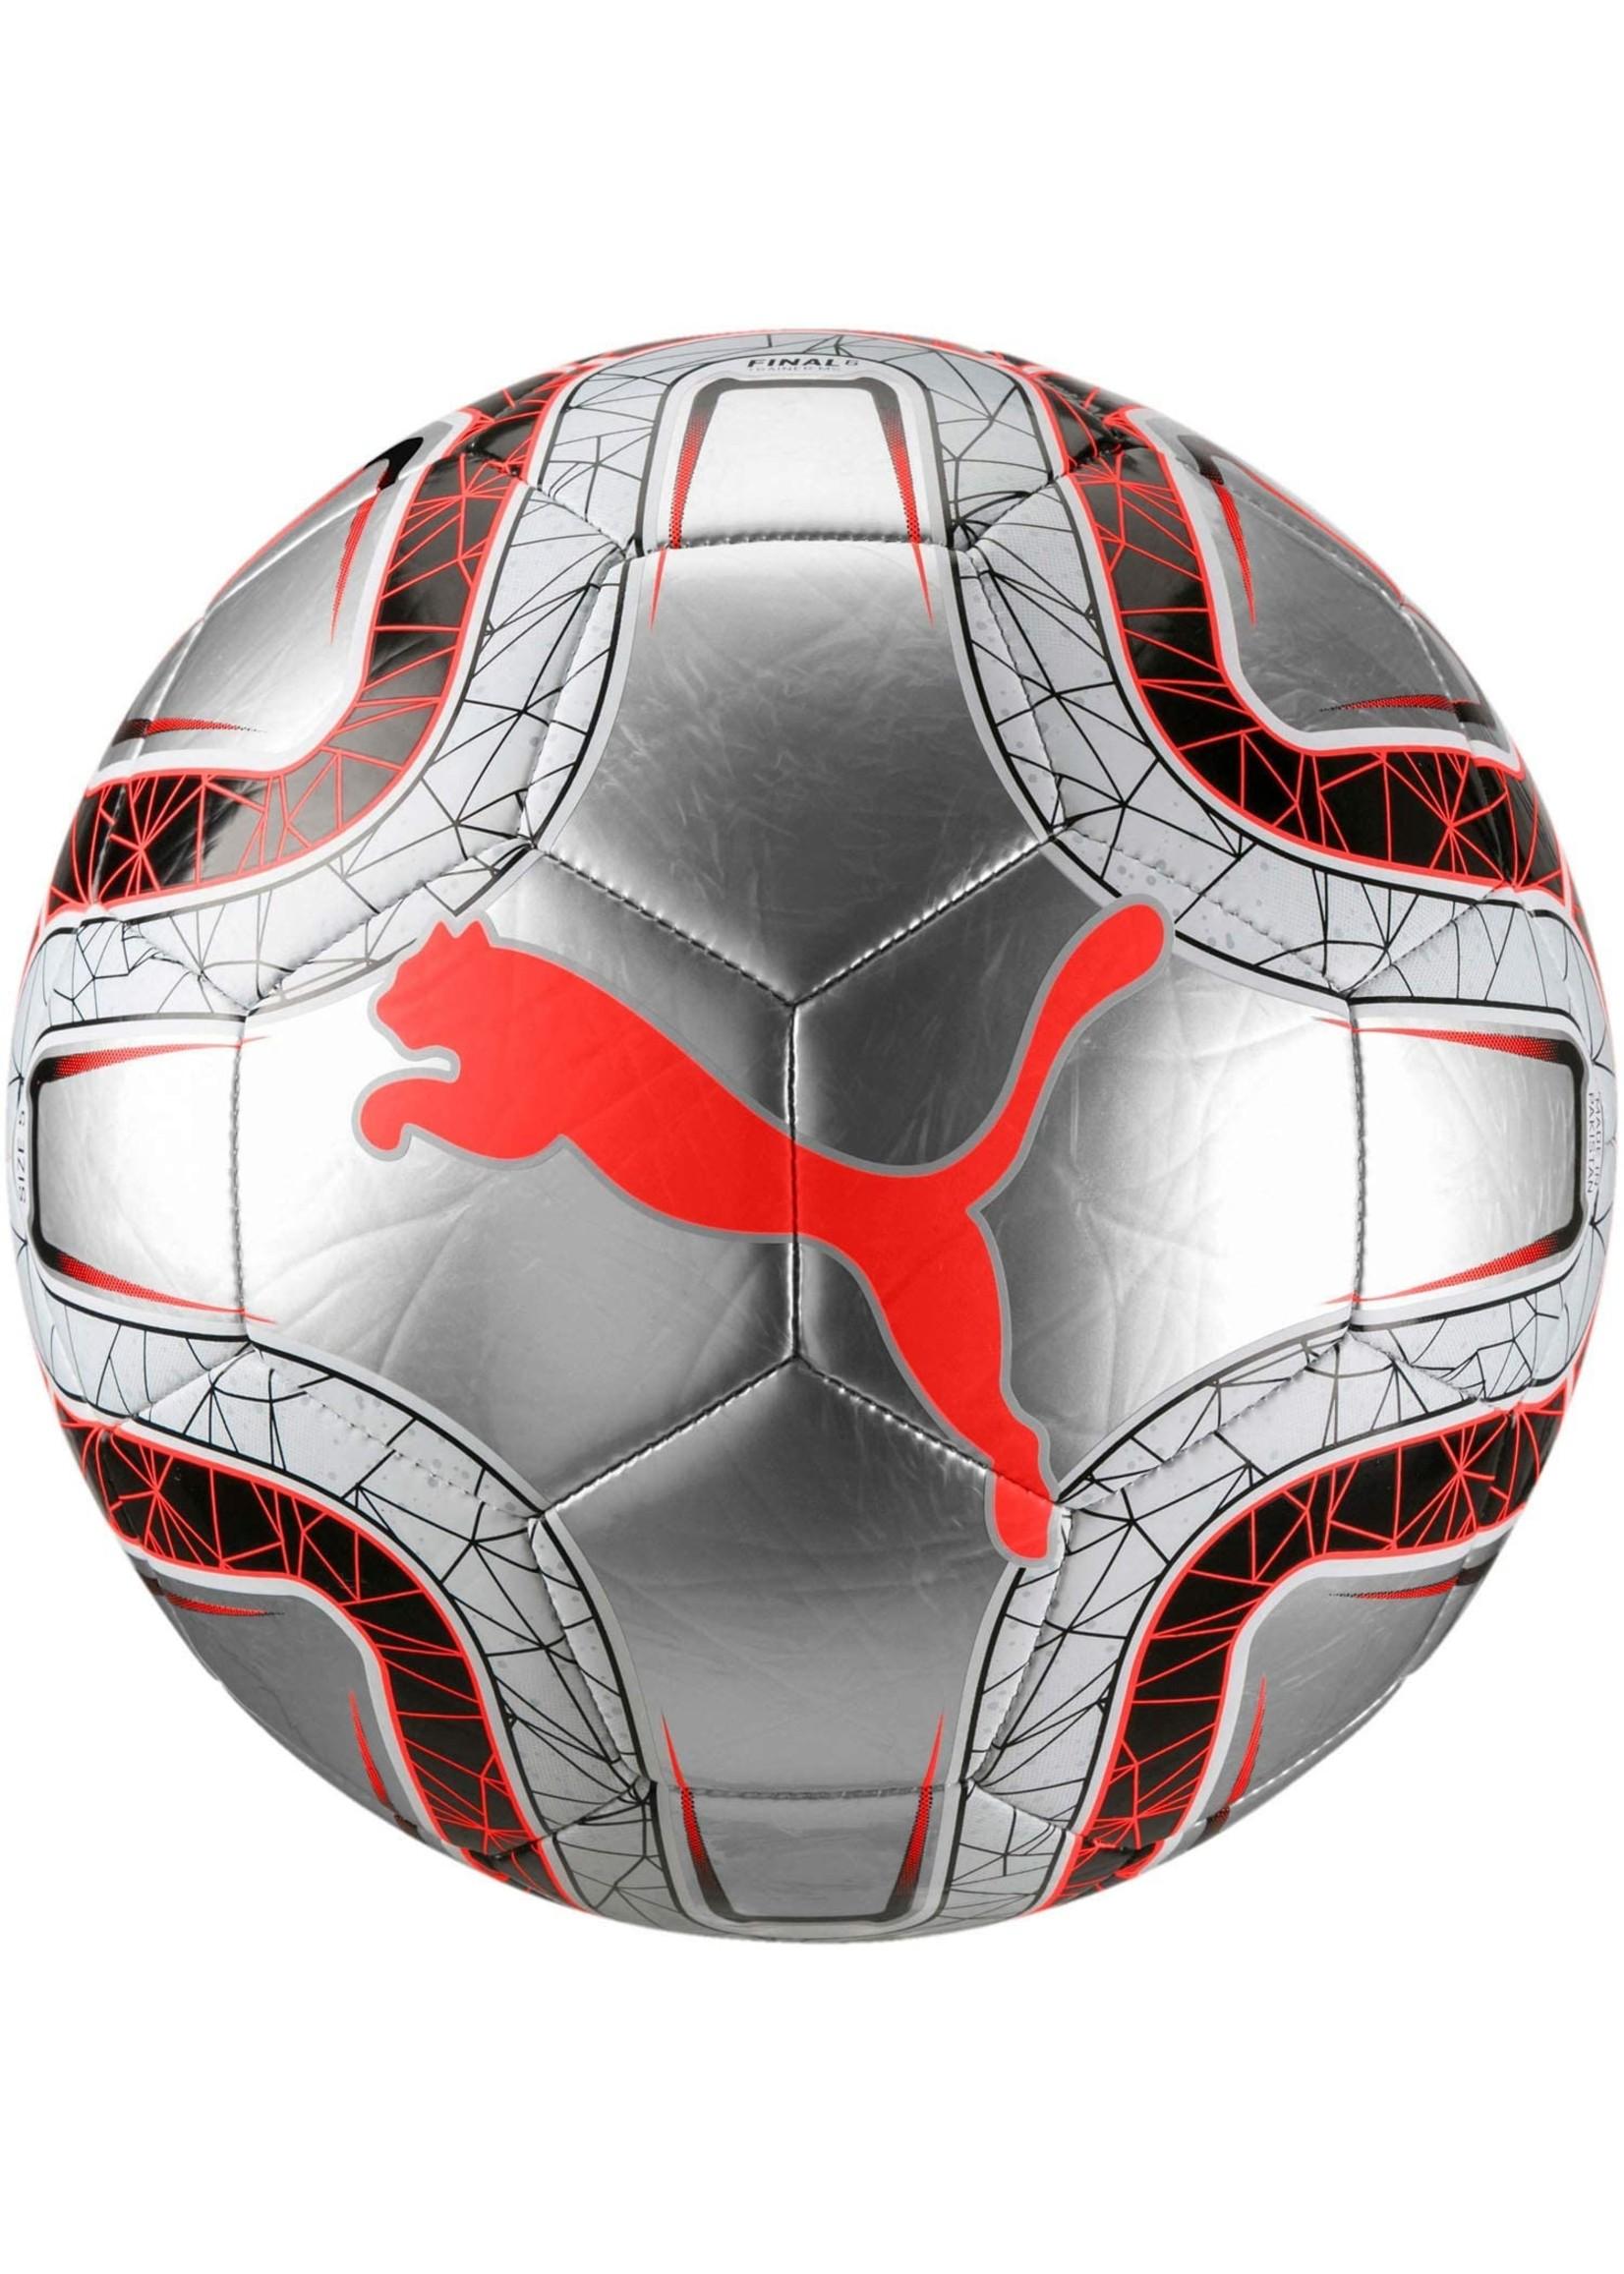 Puma SOCCER BALL PUMA FINAL 6 MS TRAINER ARGENT-GRIS-ROUGE